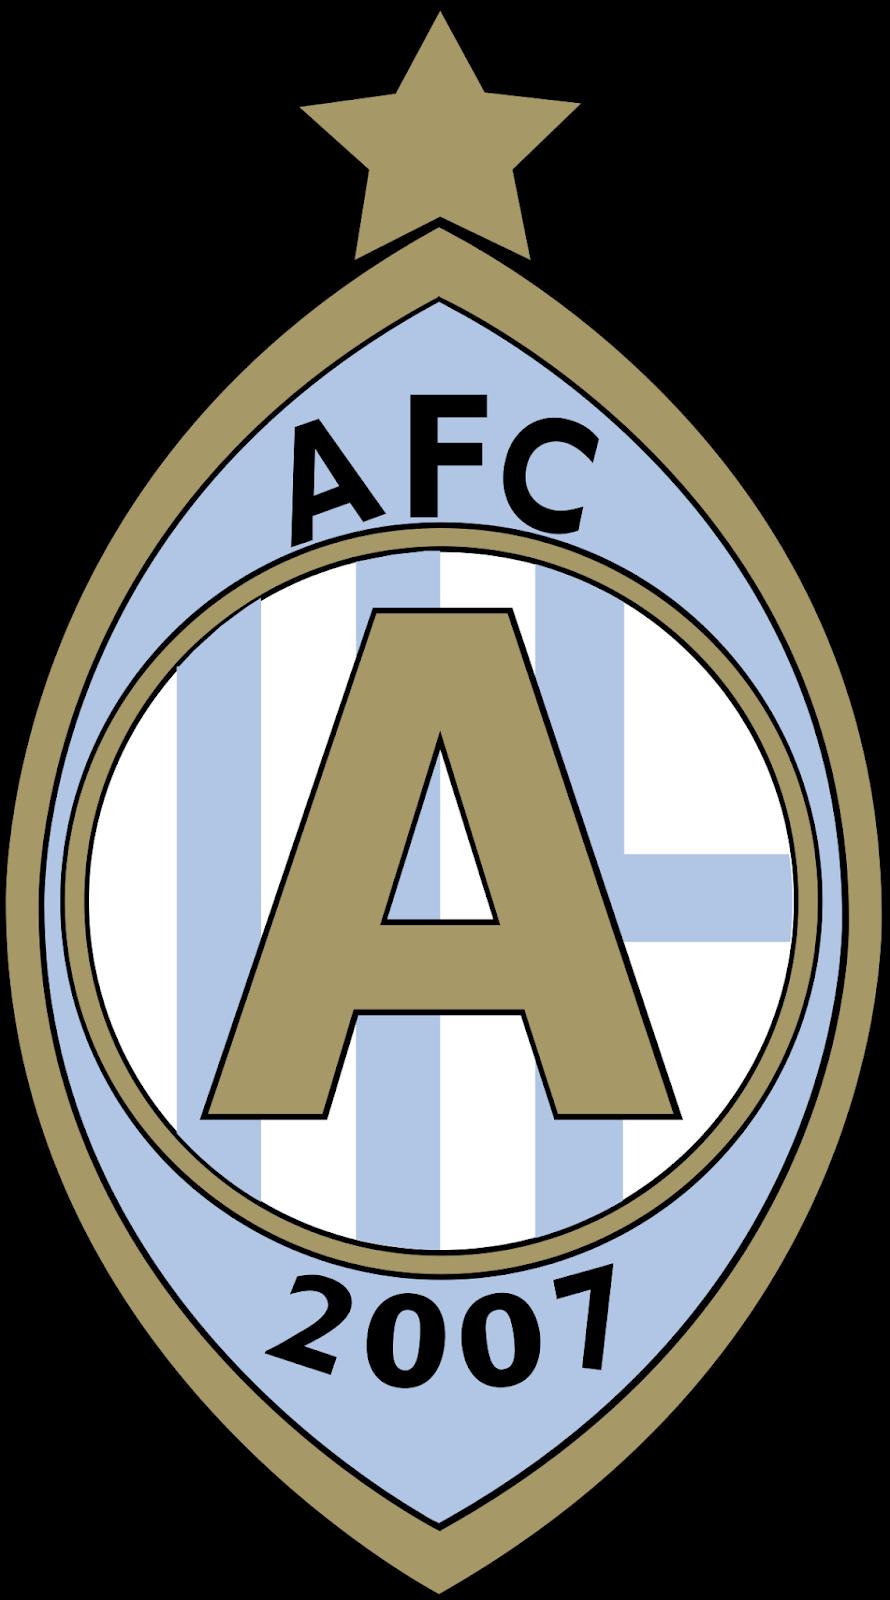 AFC Eskilstuna www.nhandinhbongdaso.net